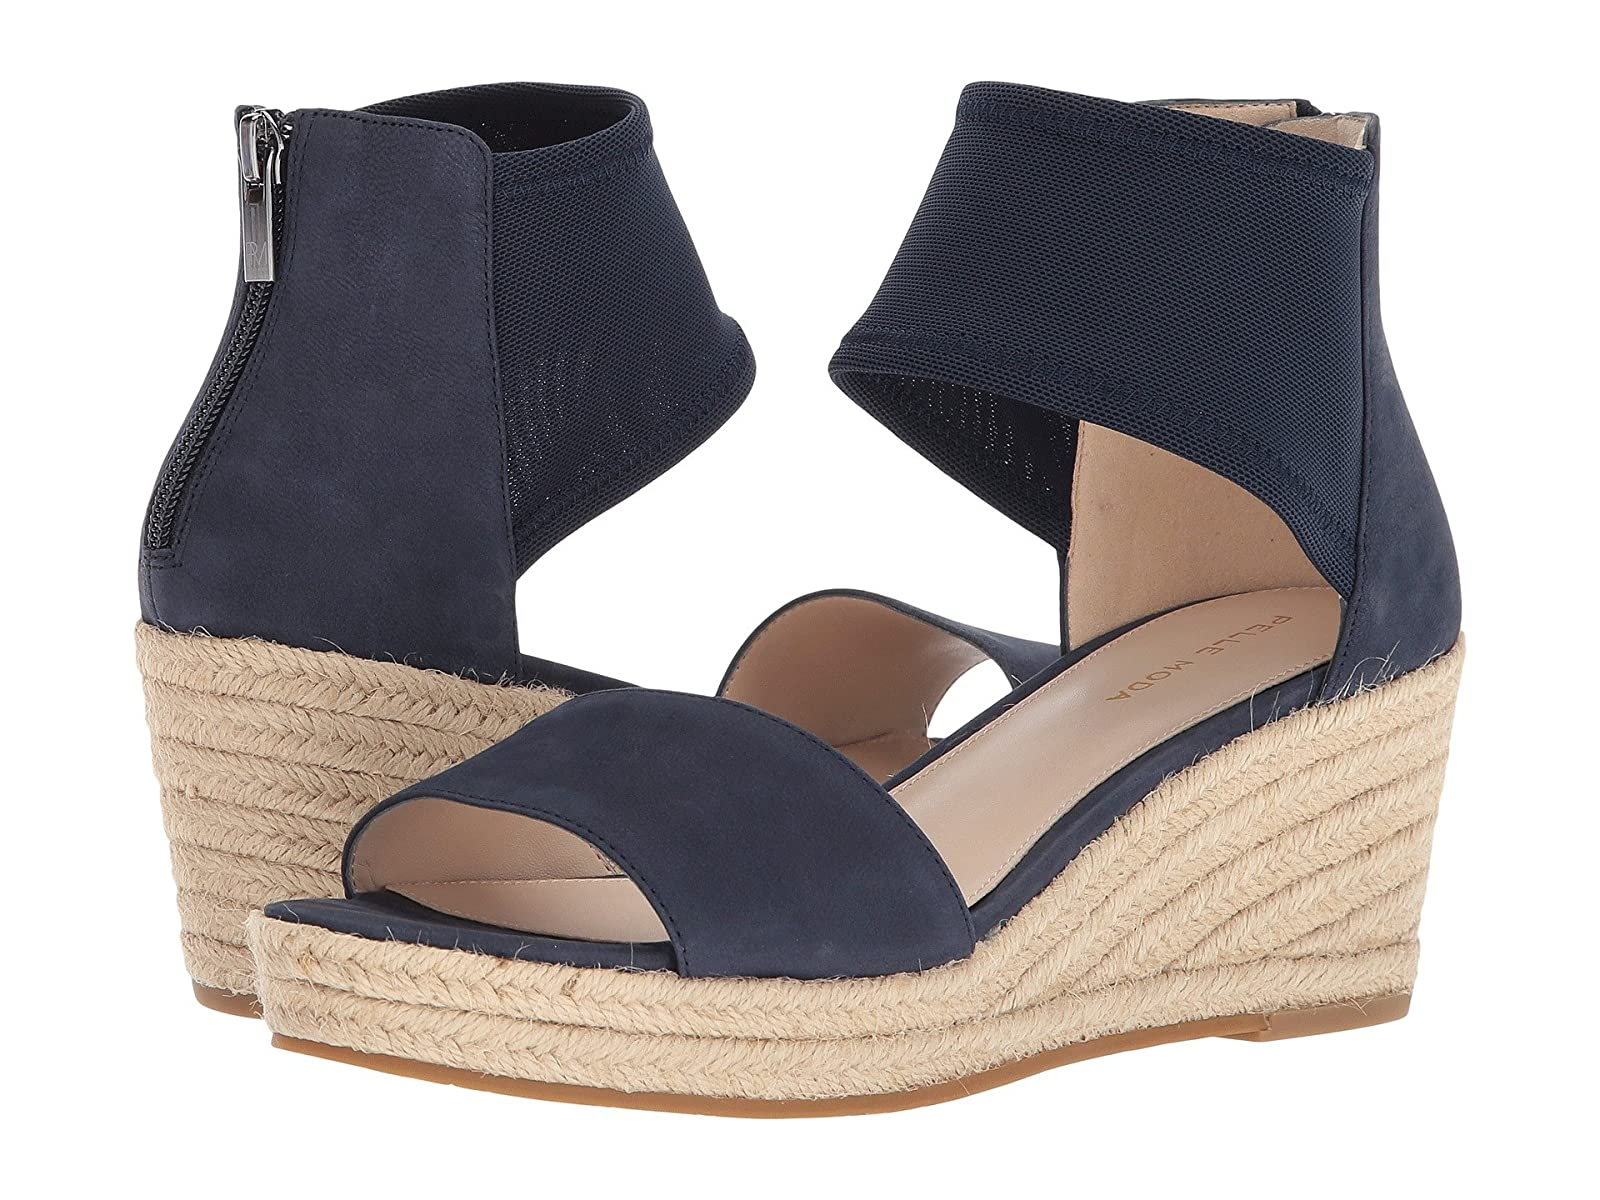 Pelle Moda KonaAtmospheric grades have affordable shoes